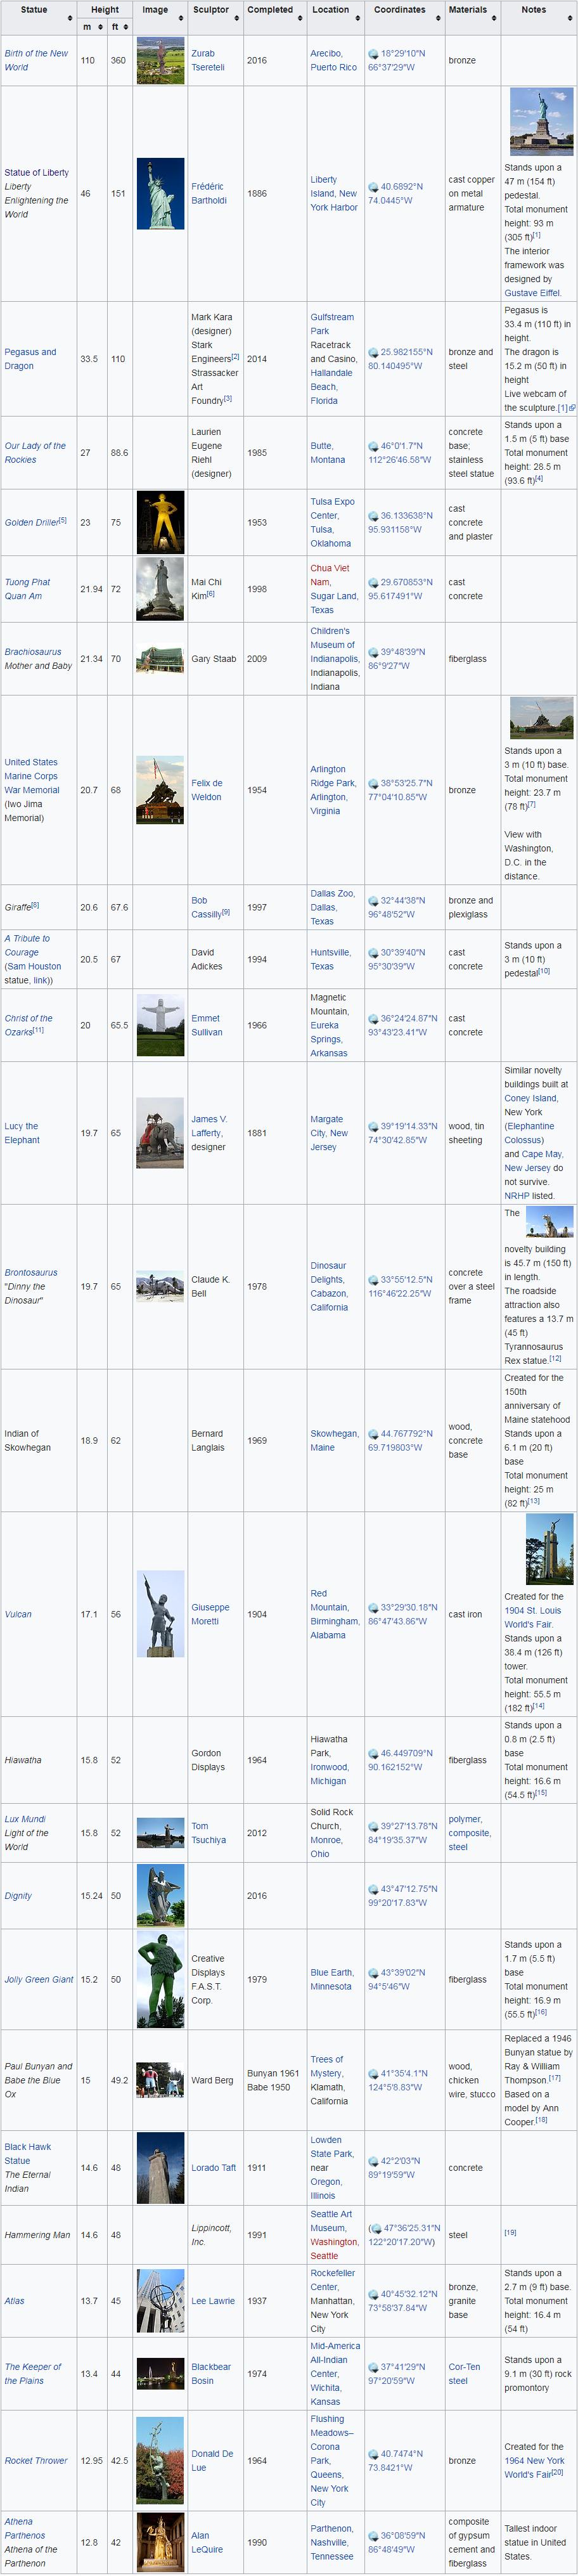 Opera Snapshot_2017-11-17_204539_en.wikipedia.org